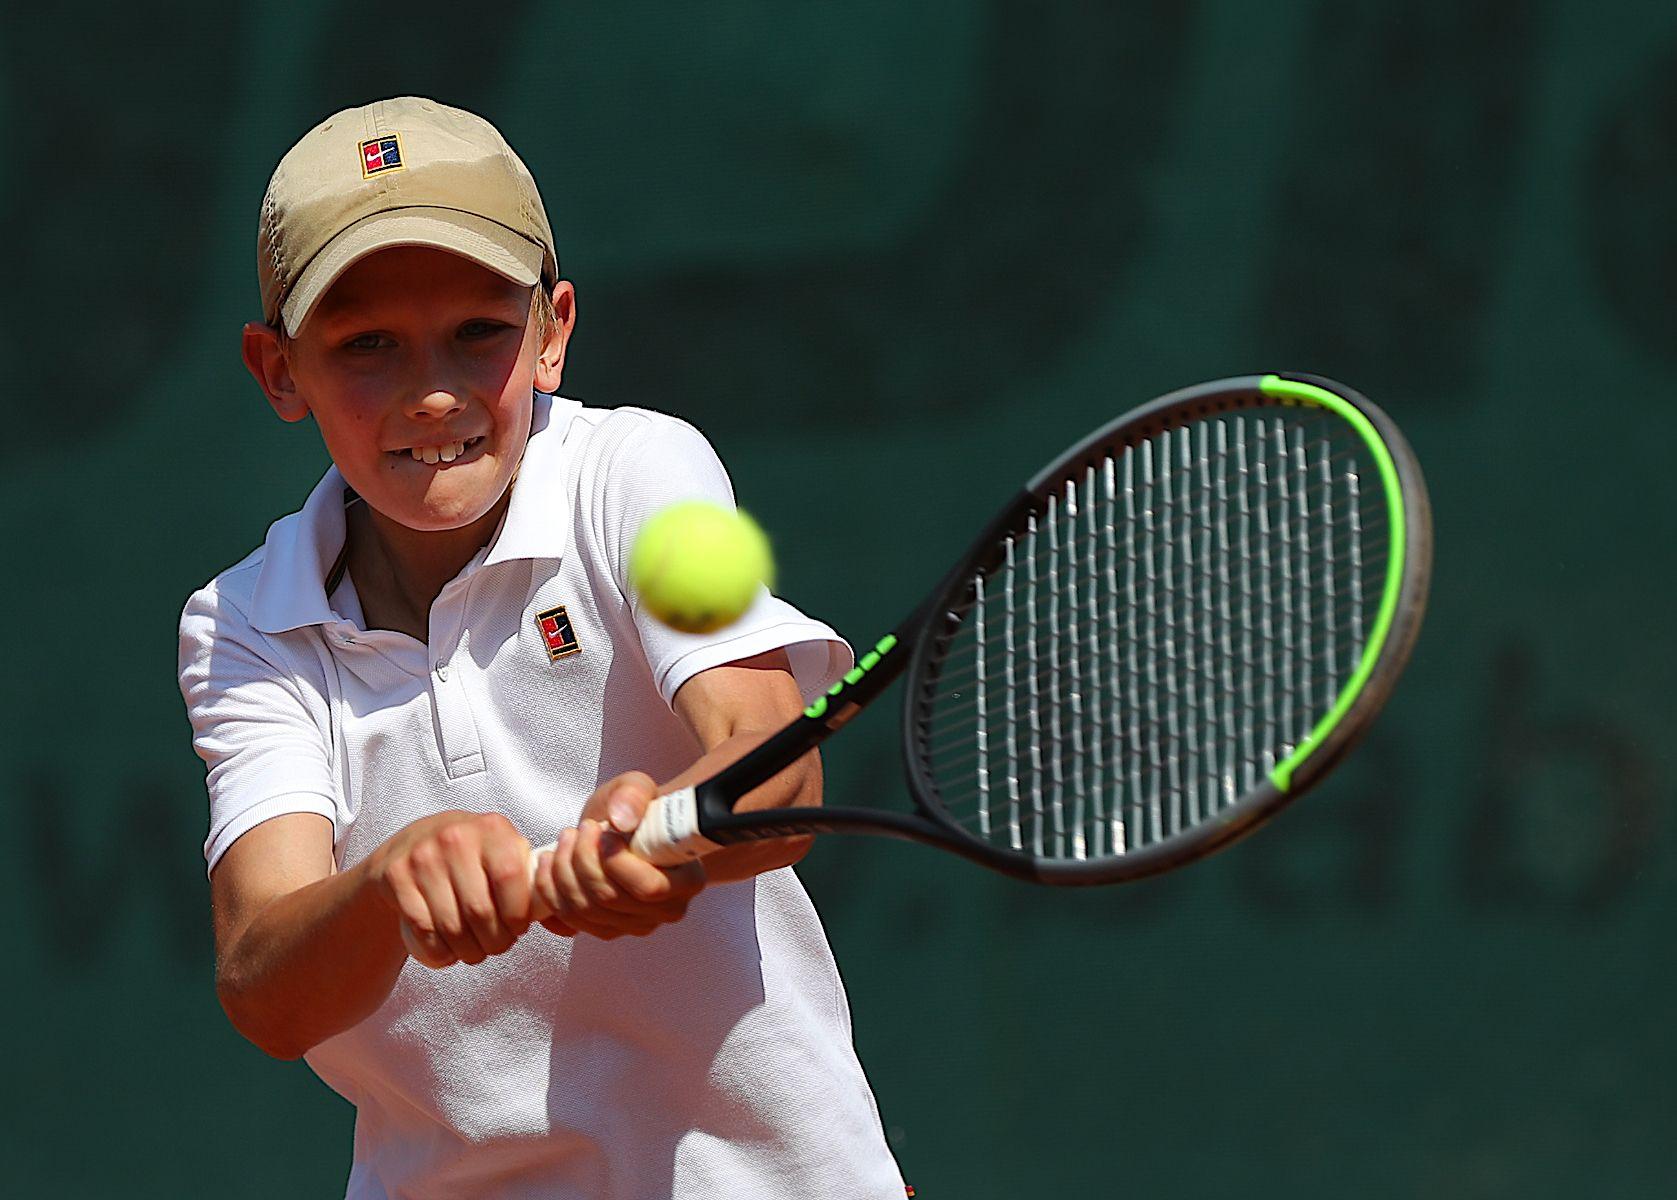 Юношеский чемпионат... tennis big moscow junior russia racket ball court Alextennis